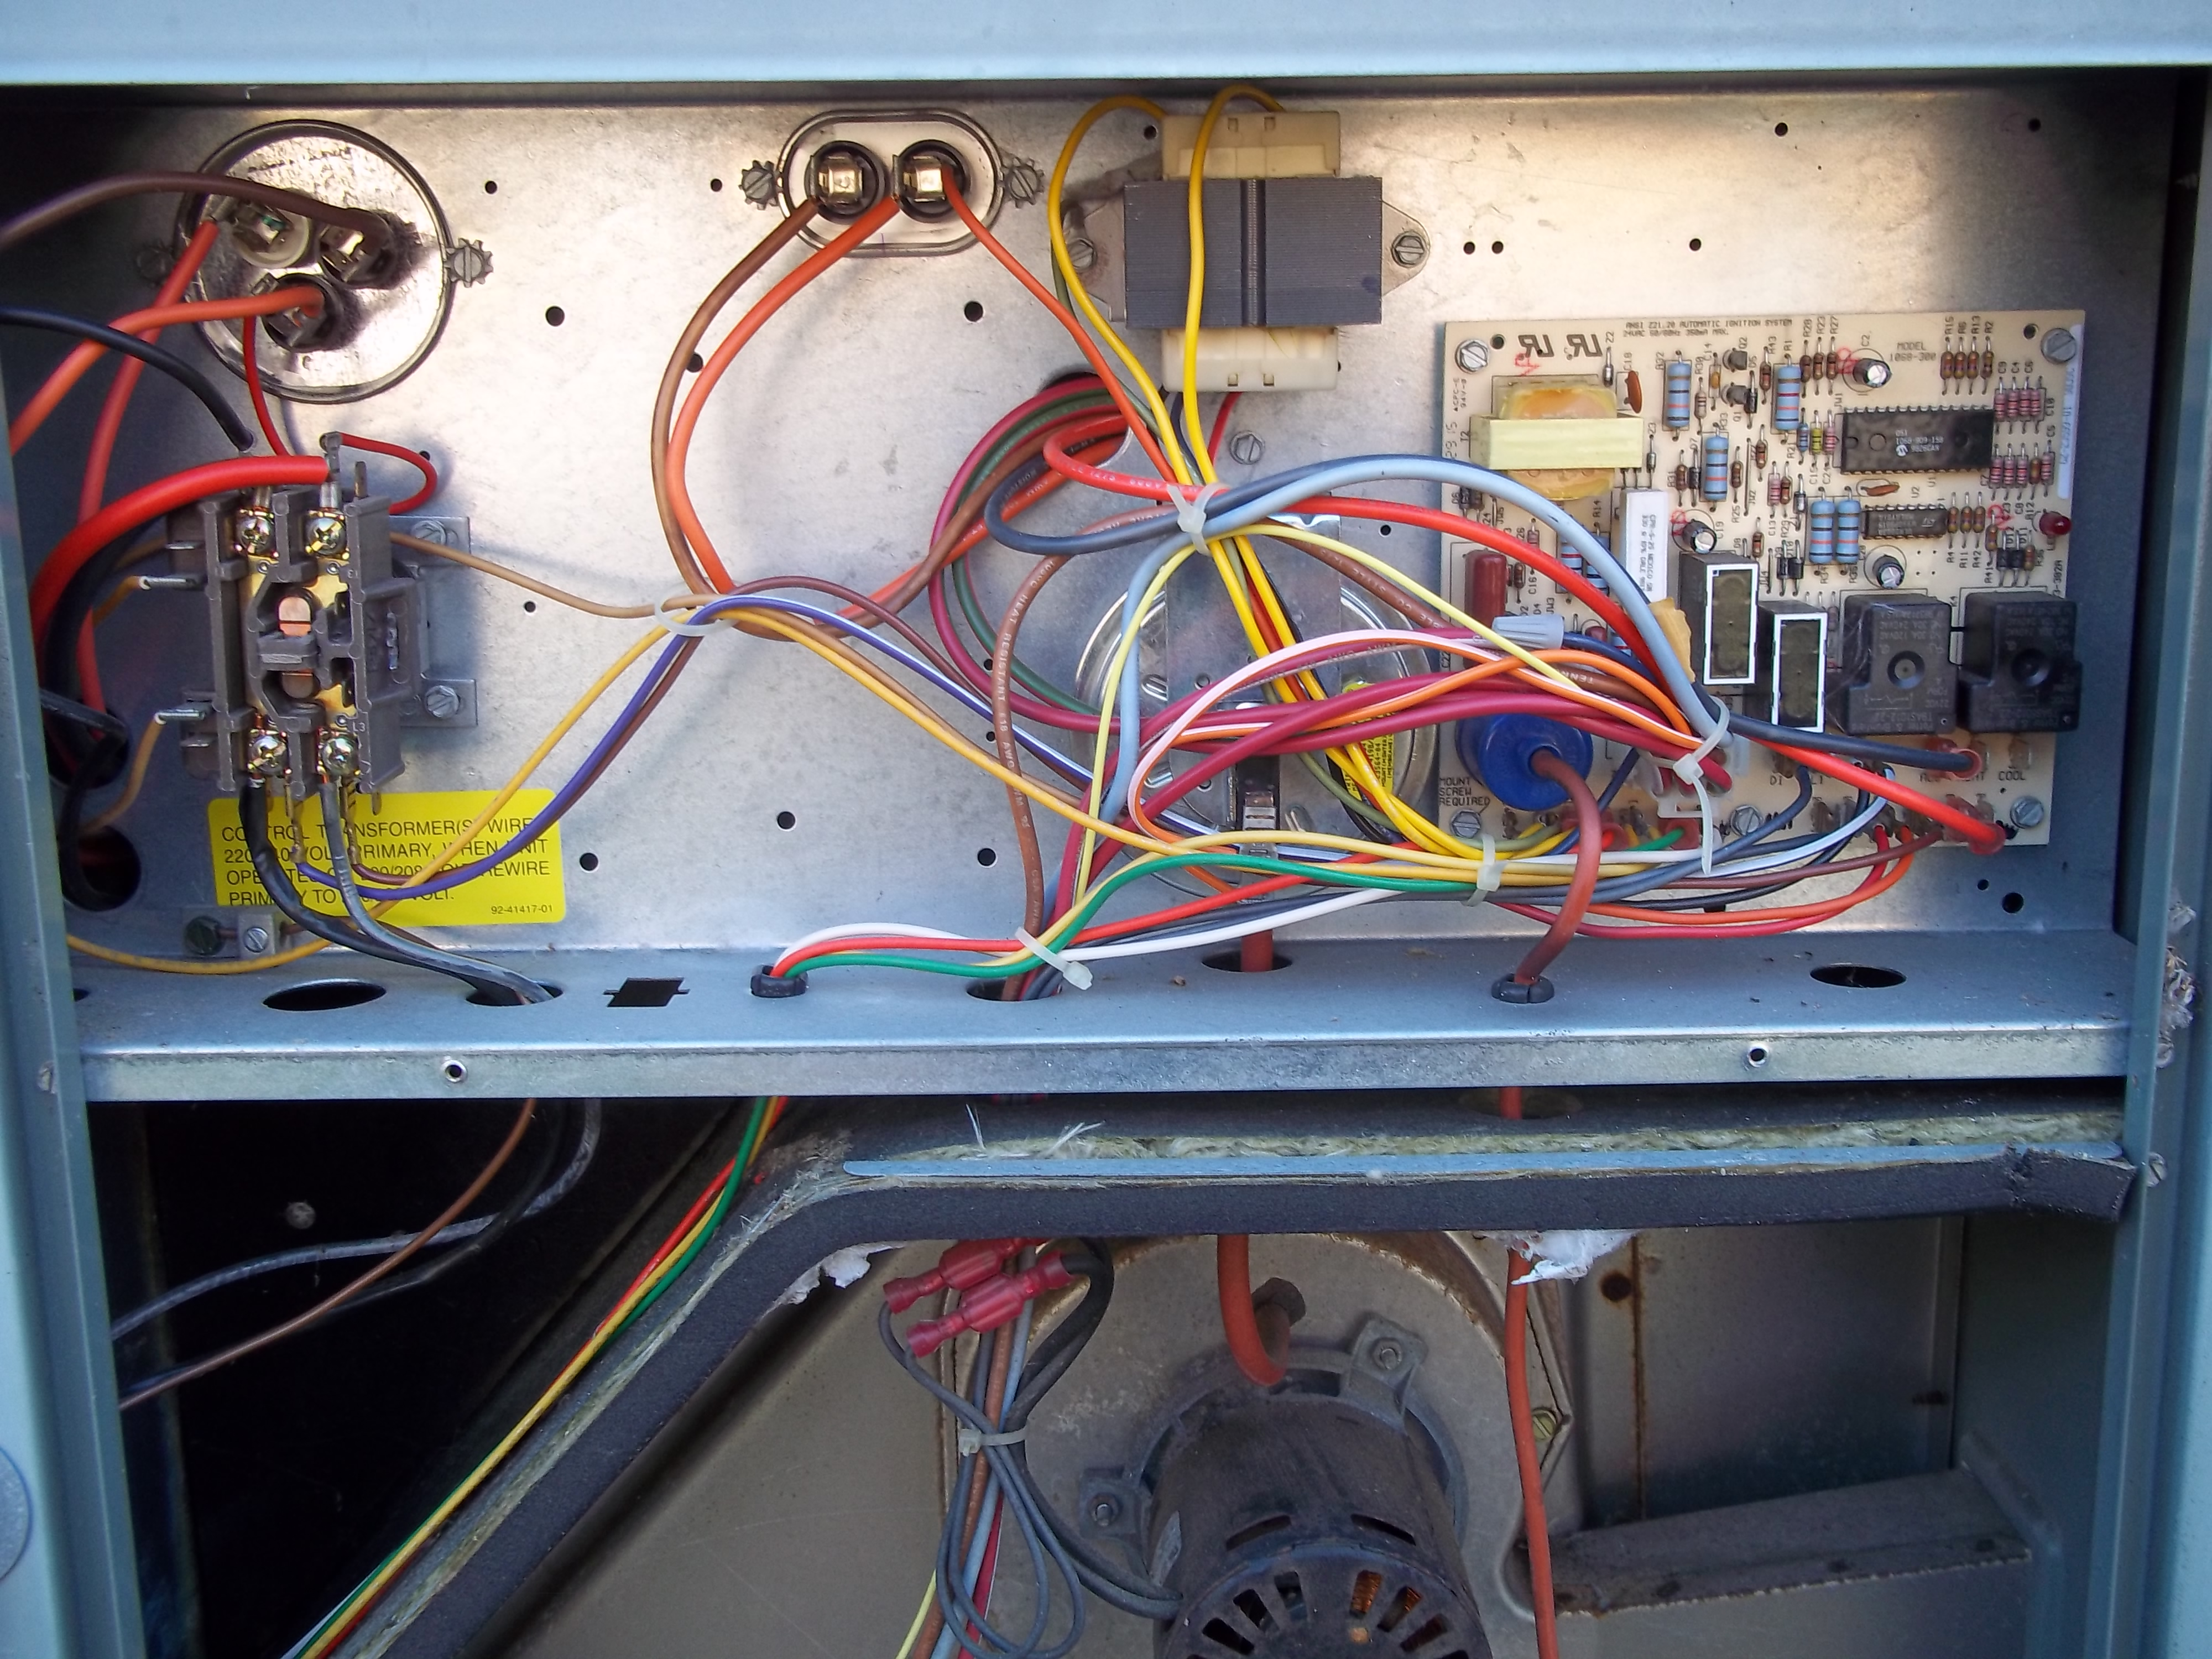 Manual For Rheem Rgph Series Rgpj Furnace Wiring Diagram Post 34408 12904510606 Thumb Array Rrka Rh Emailcanvas Com Br